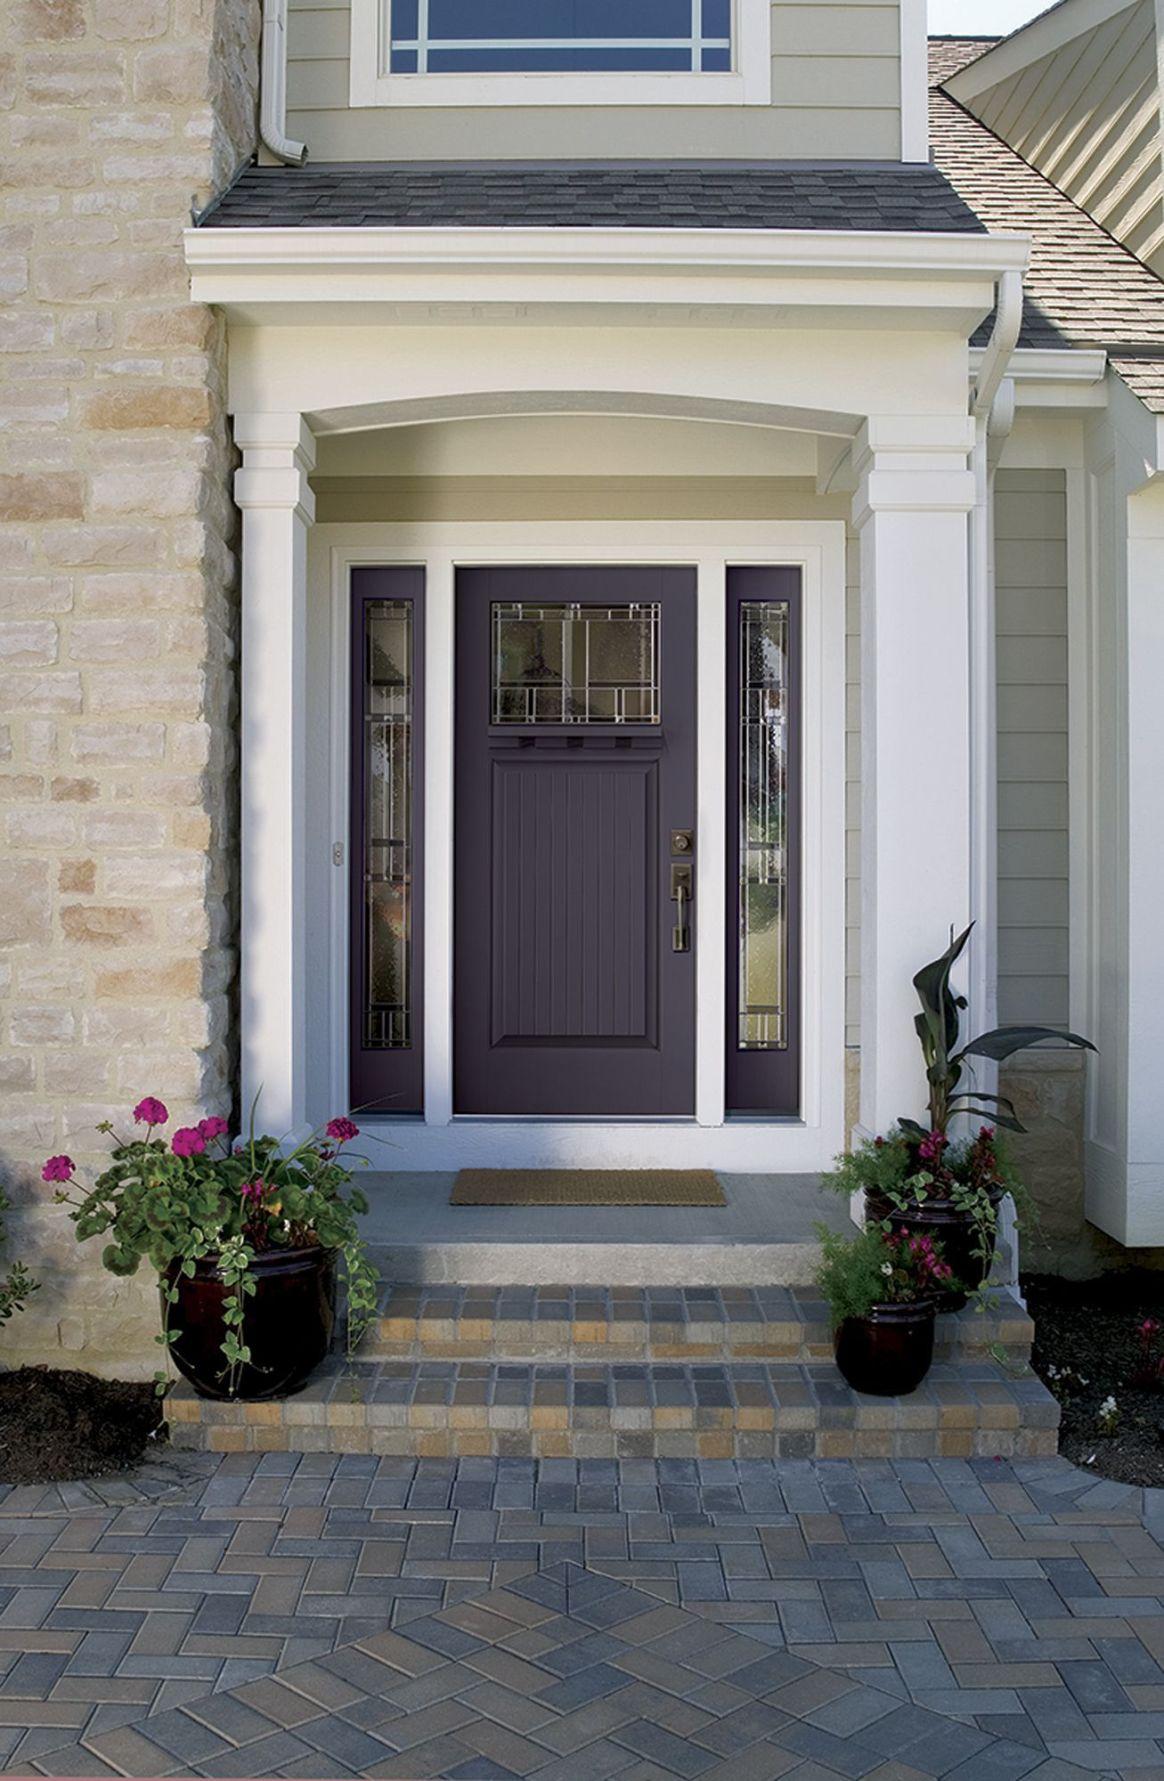 Doors that go pop: Rethinking entranceway color